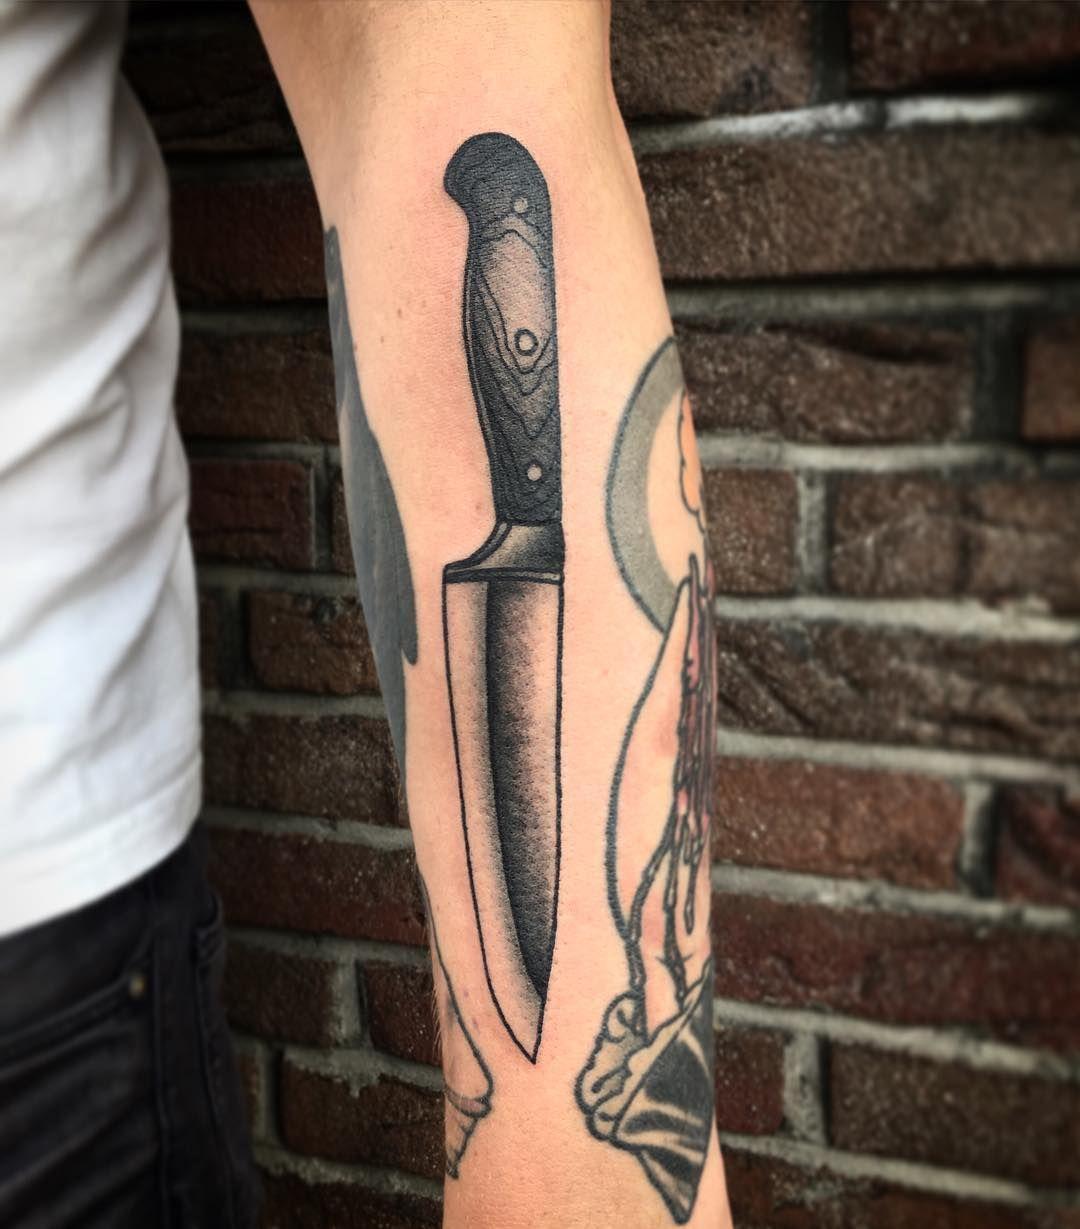 chef 39 s knife tatuajes tattoos pinterest knives tattoo and tattoo art. Black Bedroom Furniture Sets. Home Design Ideas